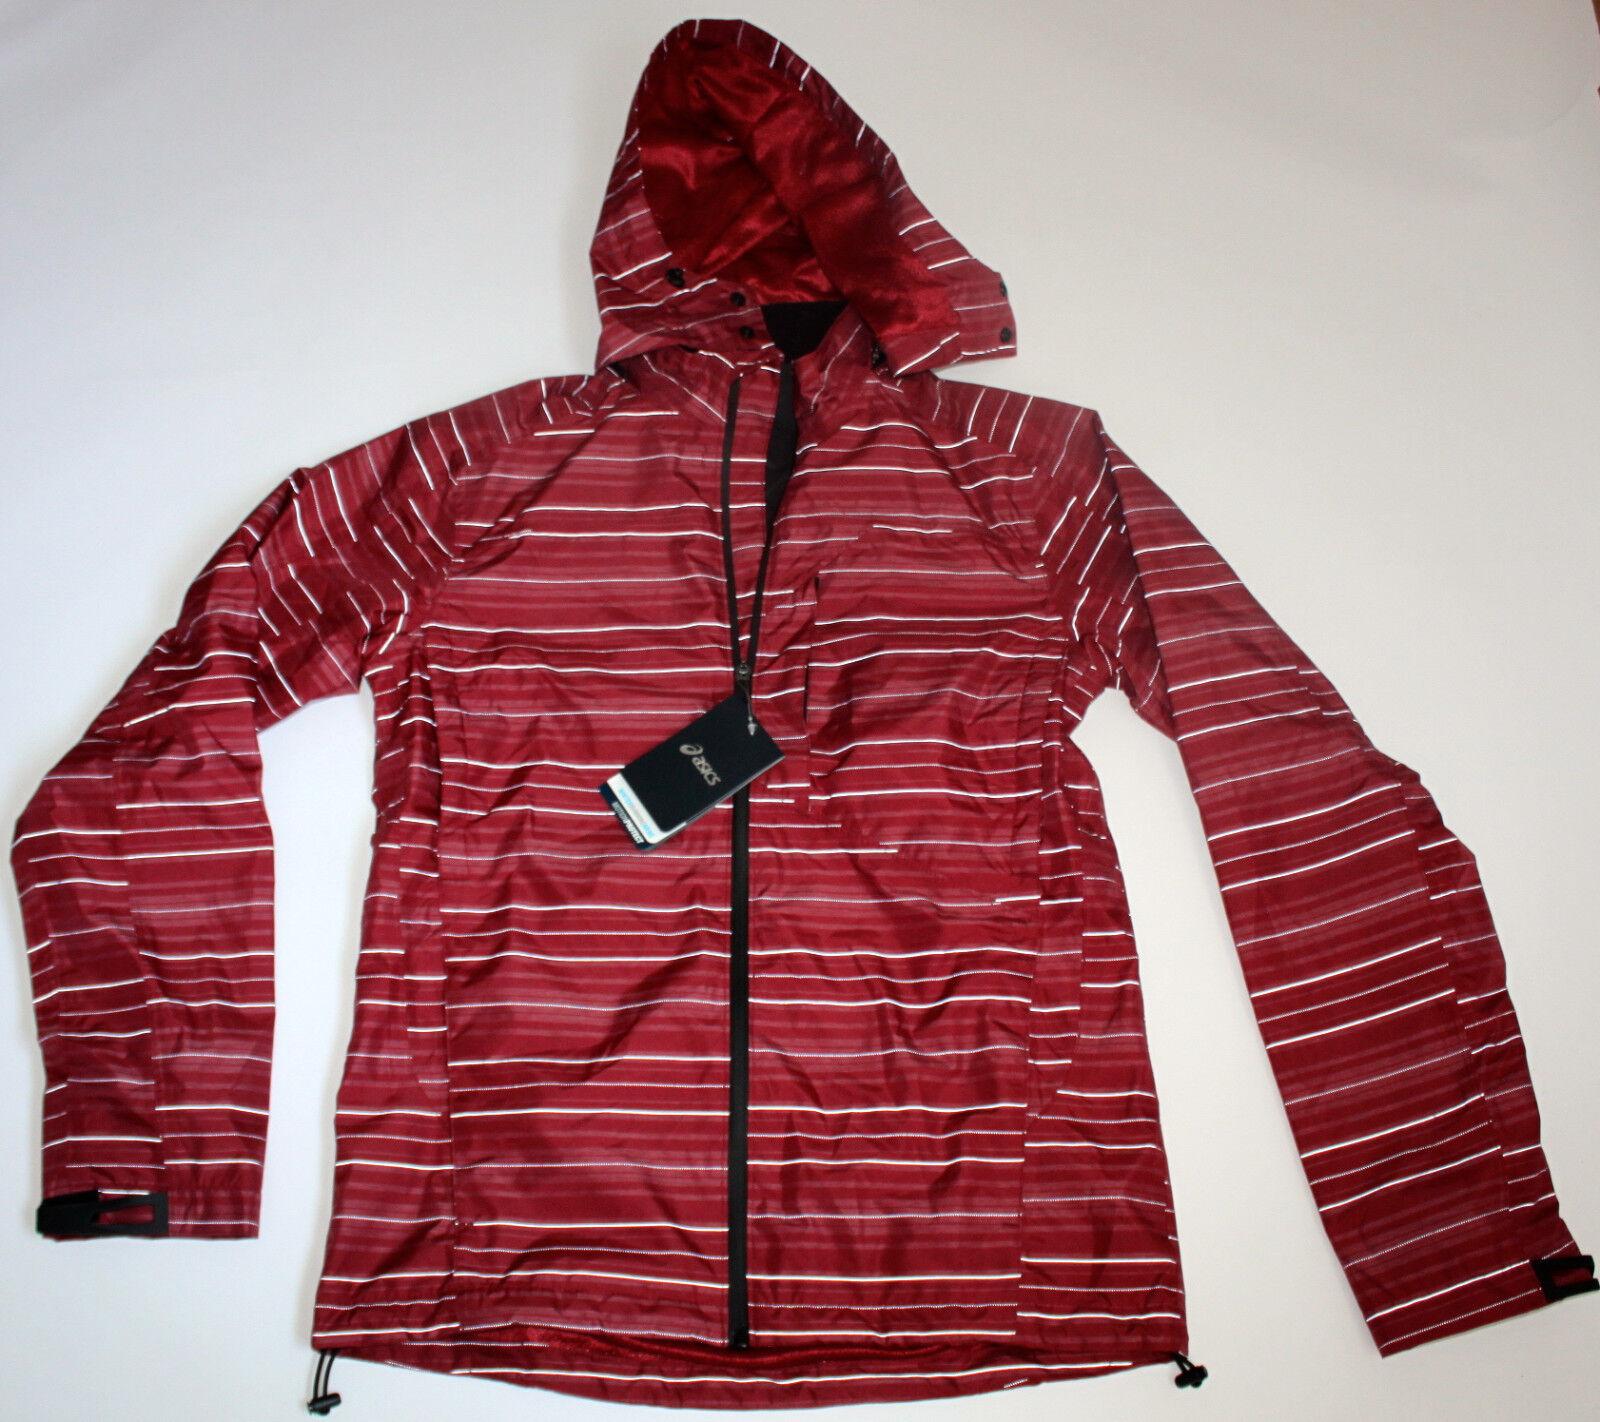 ASICS Men's Small Burgundy Red Jacket Striped Hooded Rain Co